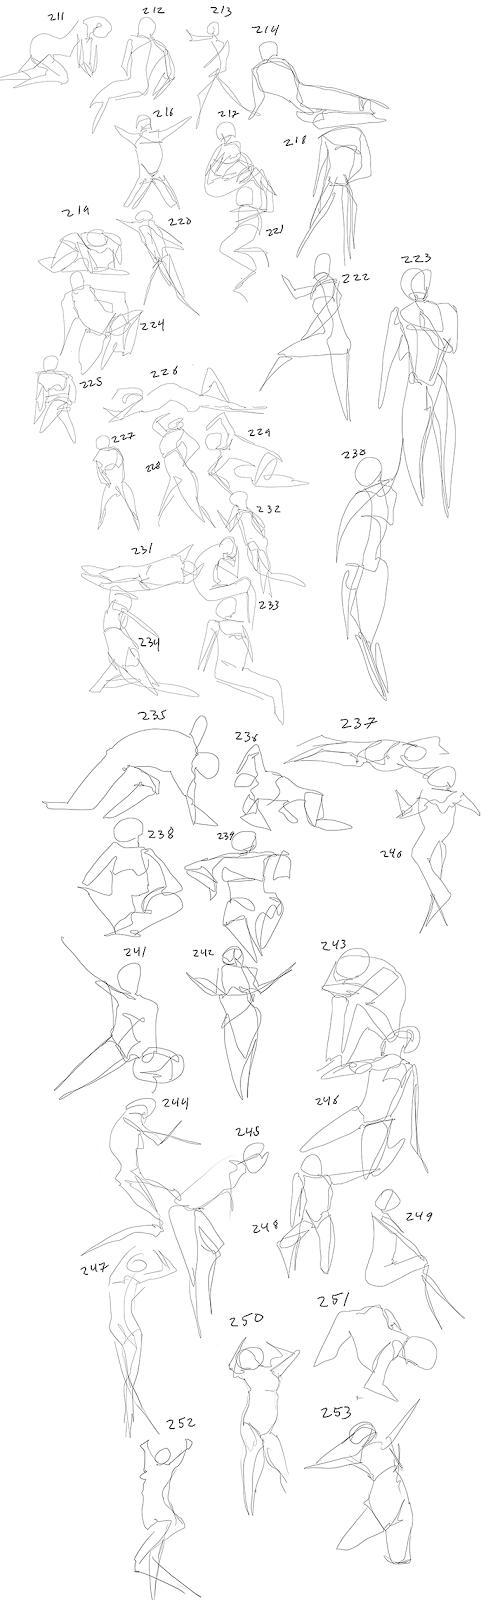 [Image: Gestures_08.png]